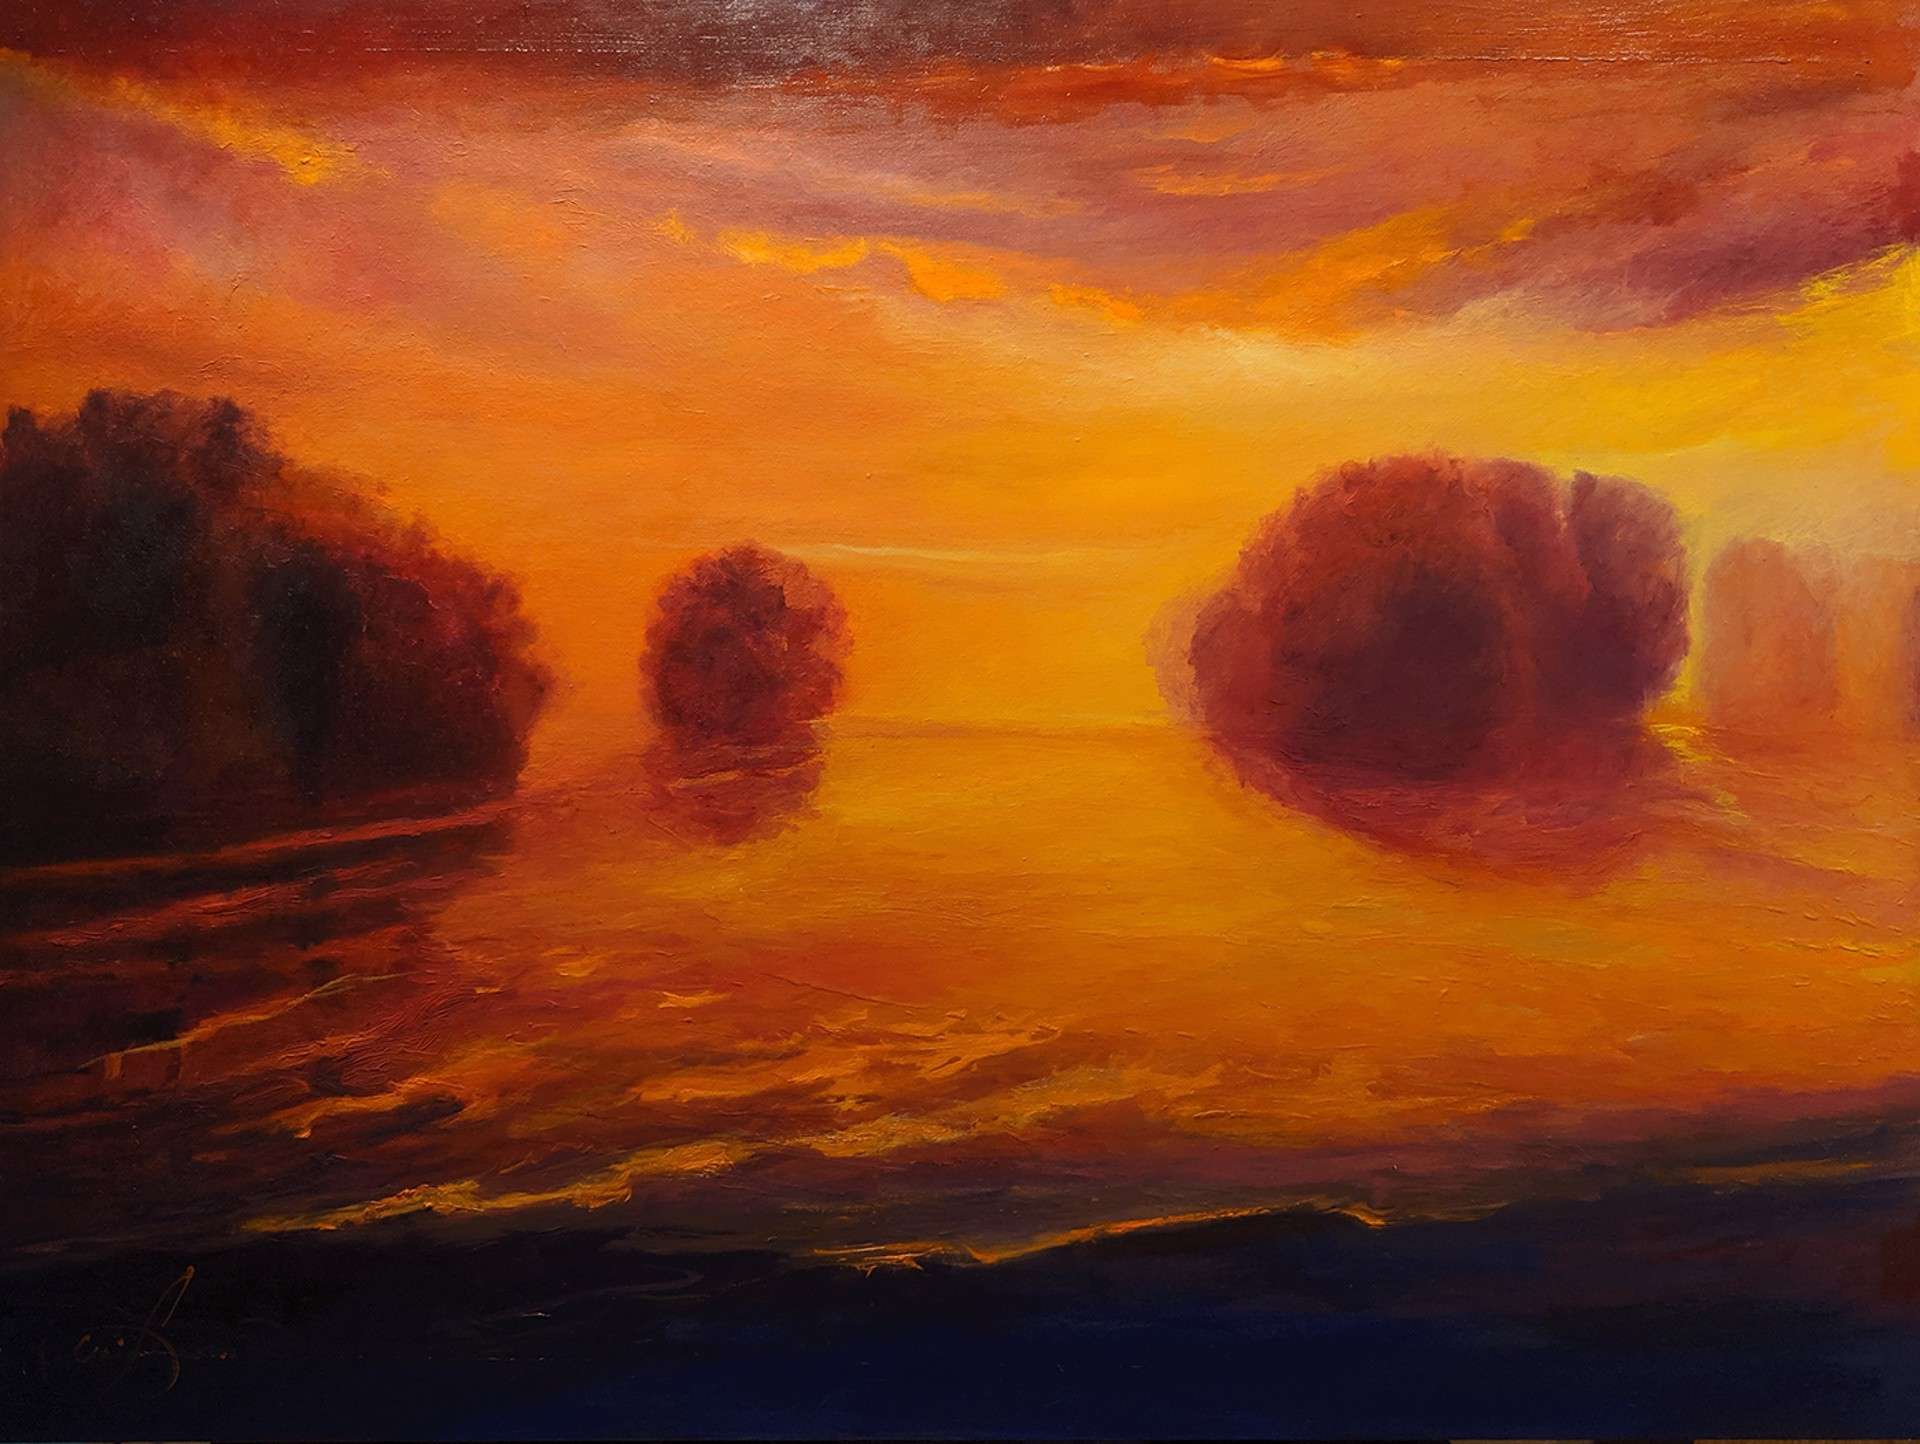 Evening Serenity by Craig Freeman